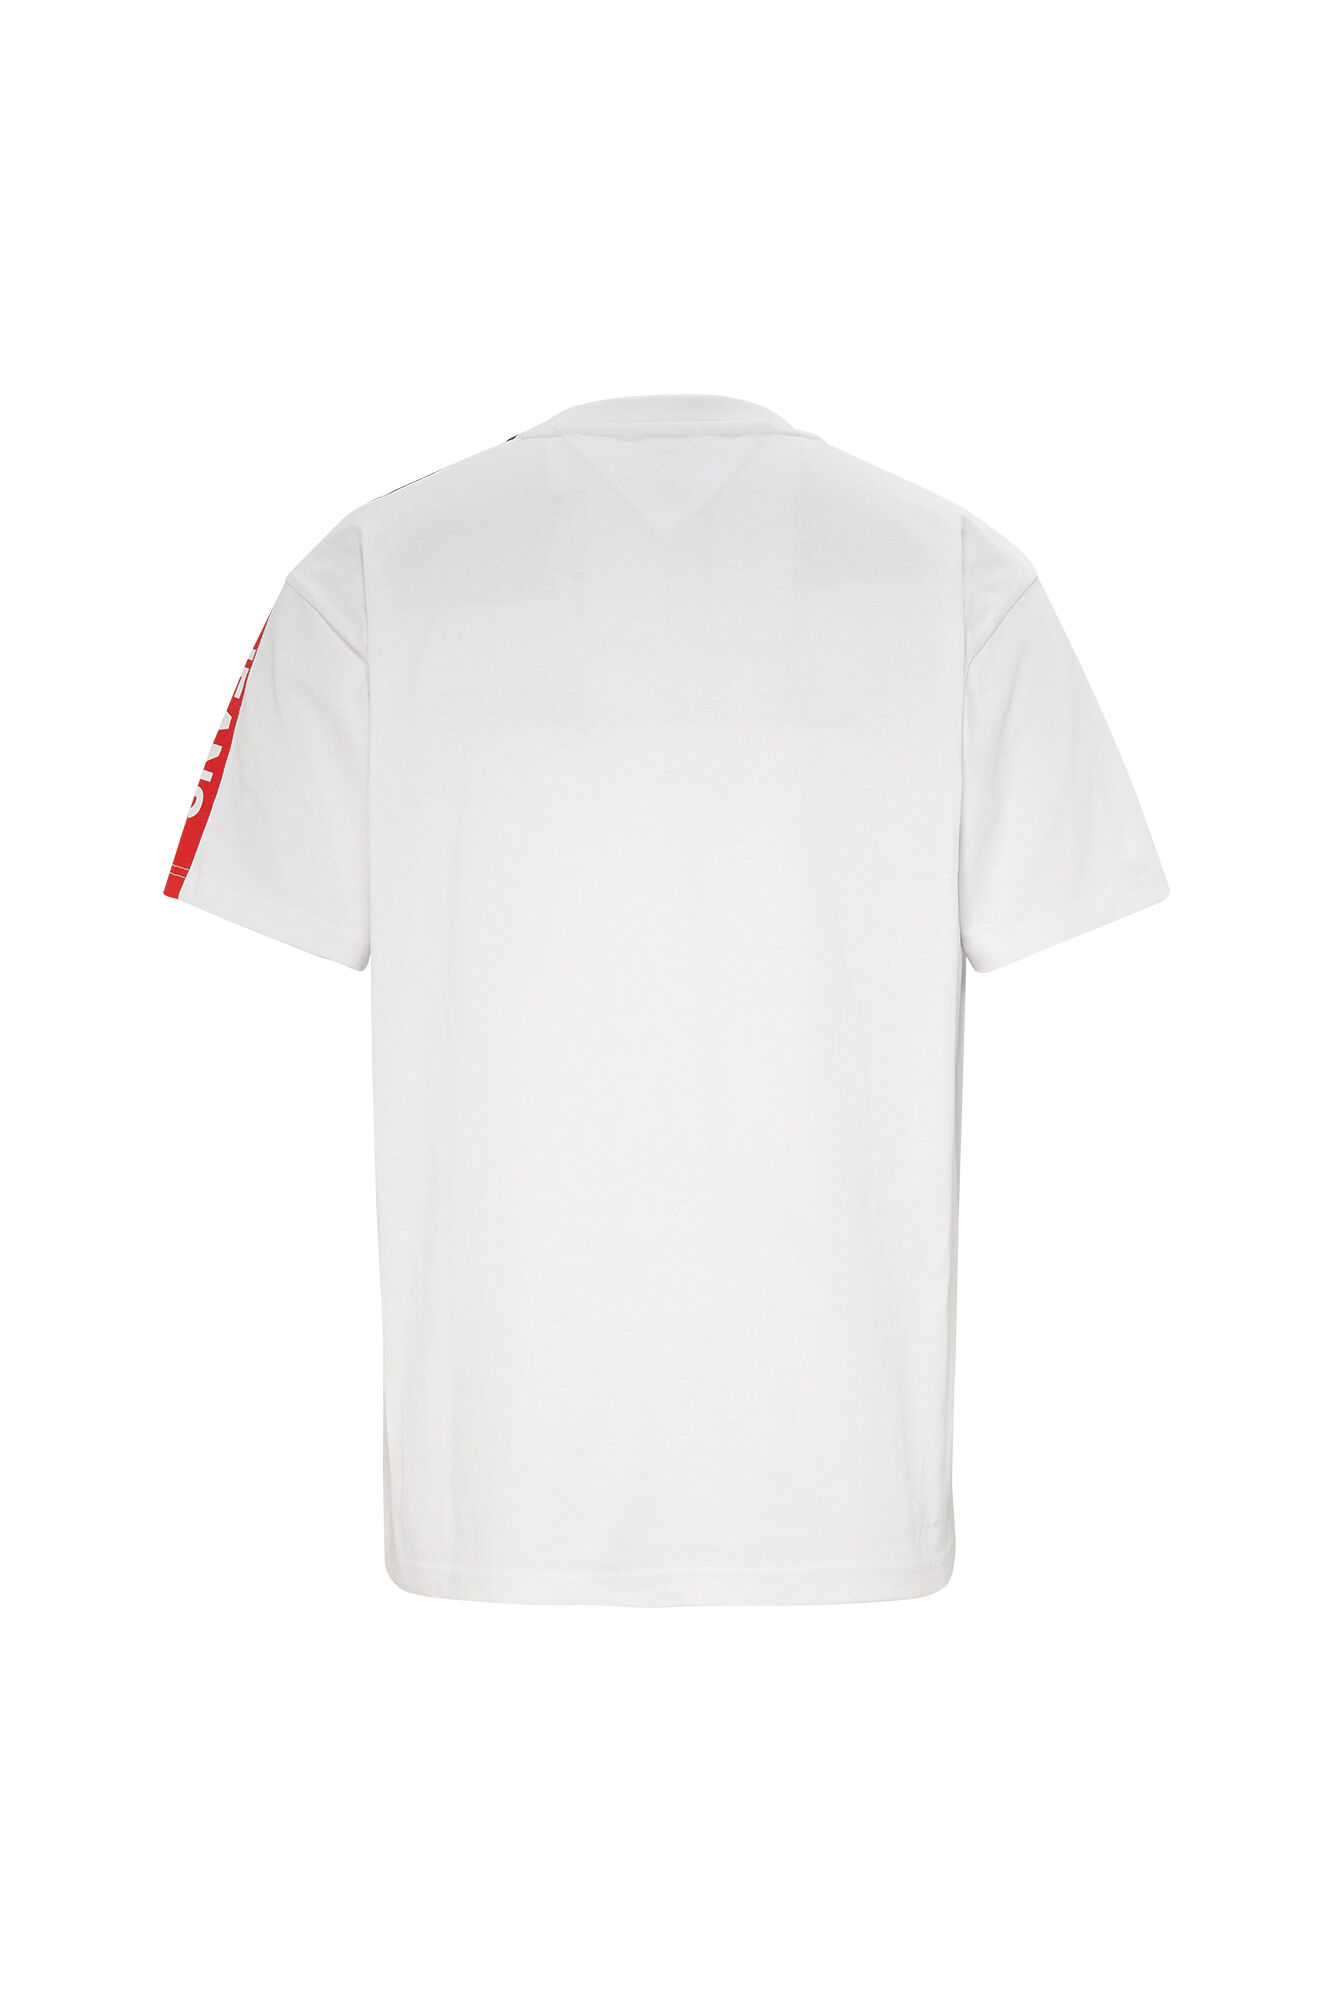 Sleeve graphic tee DM0DM06082, CLASSIC WHITE